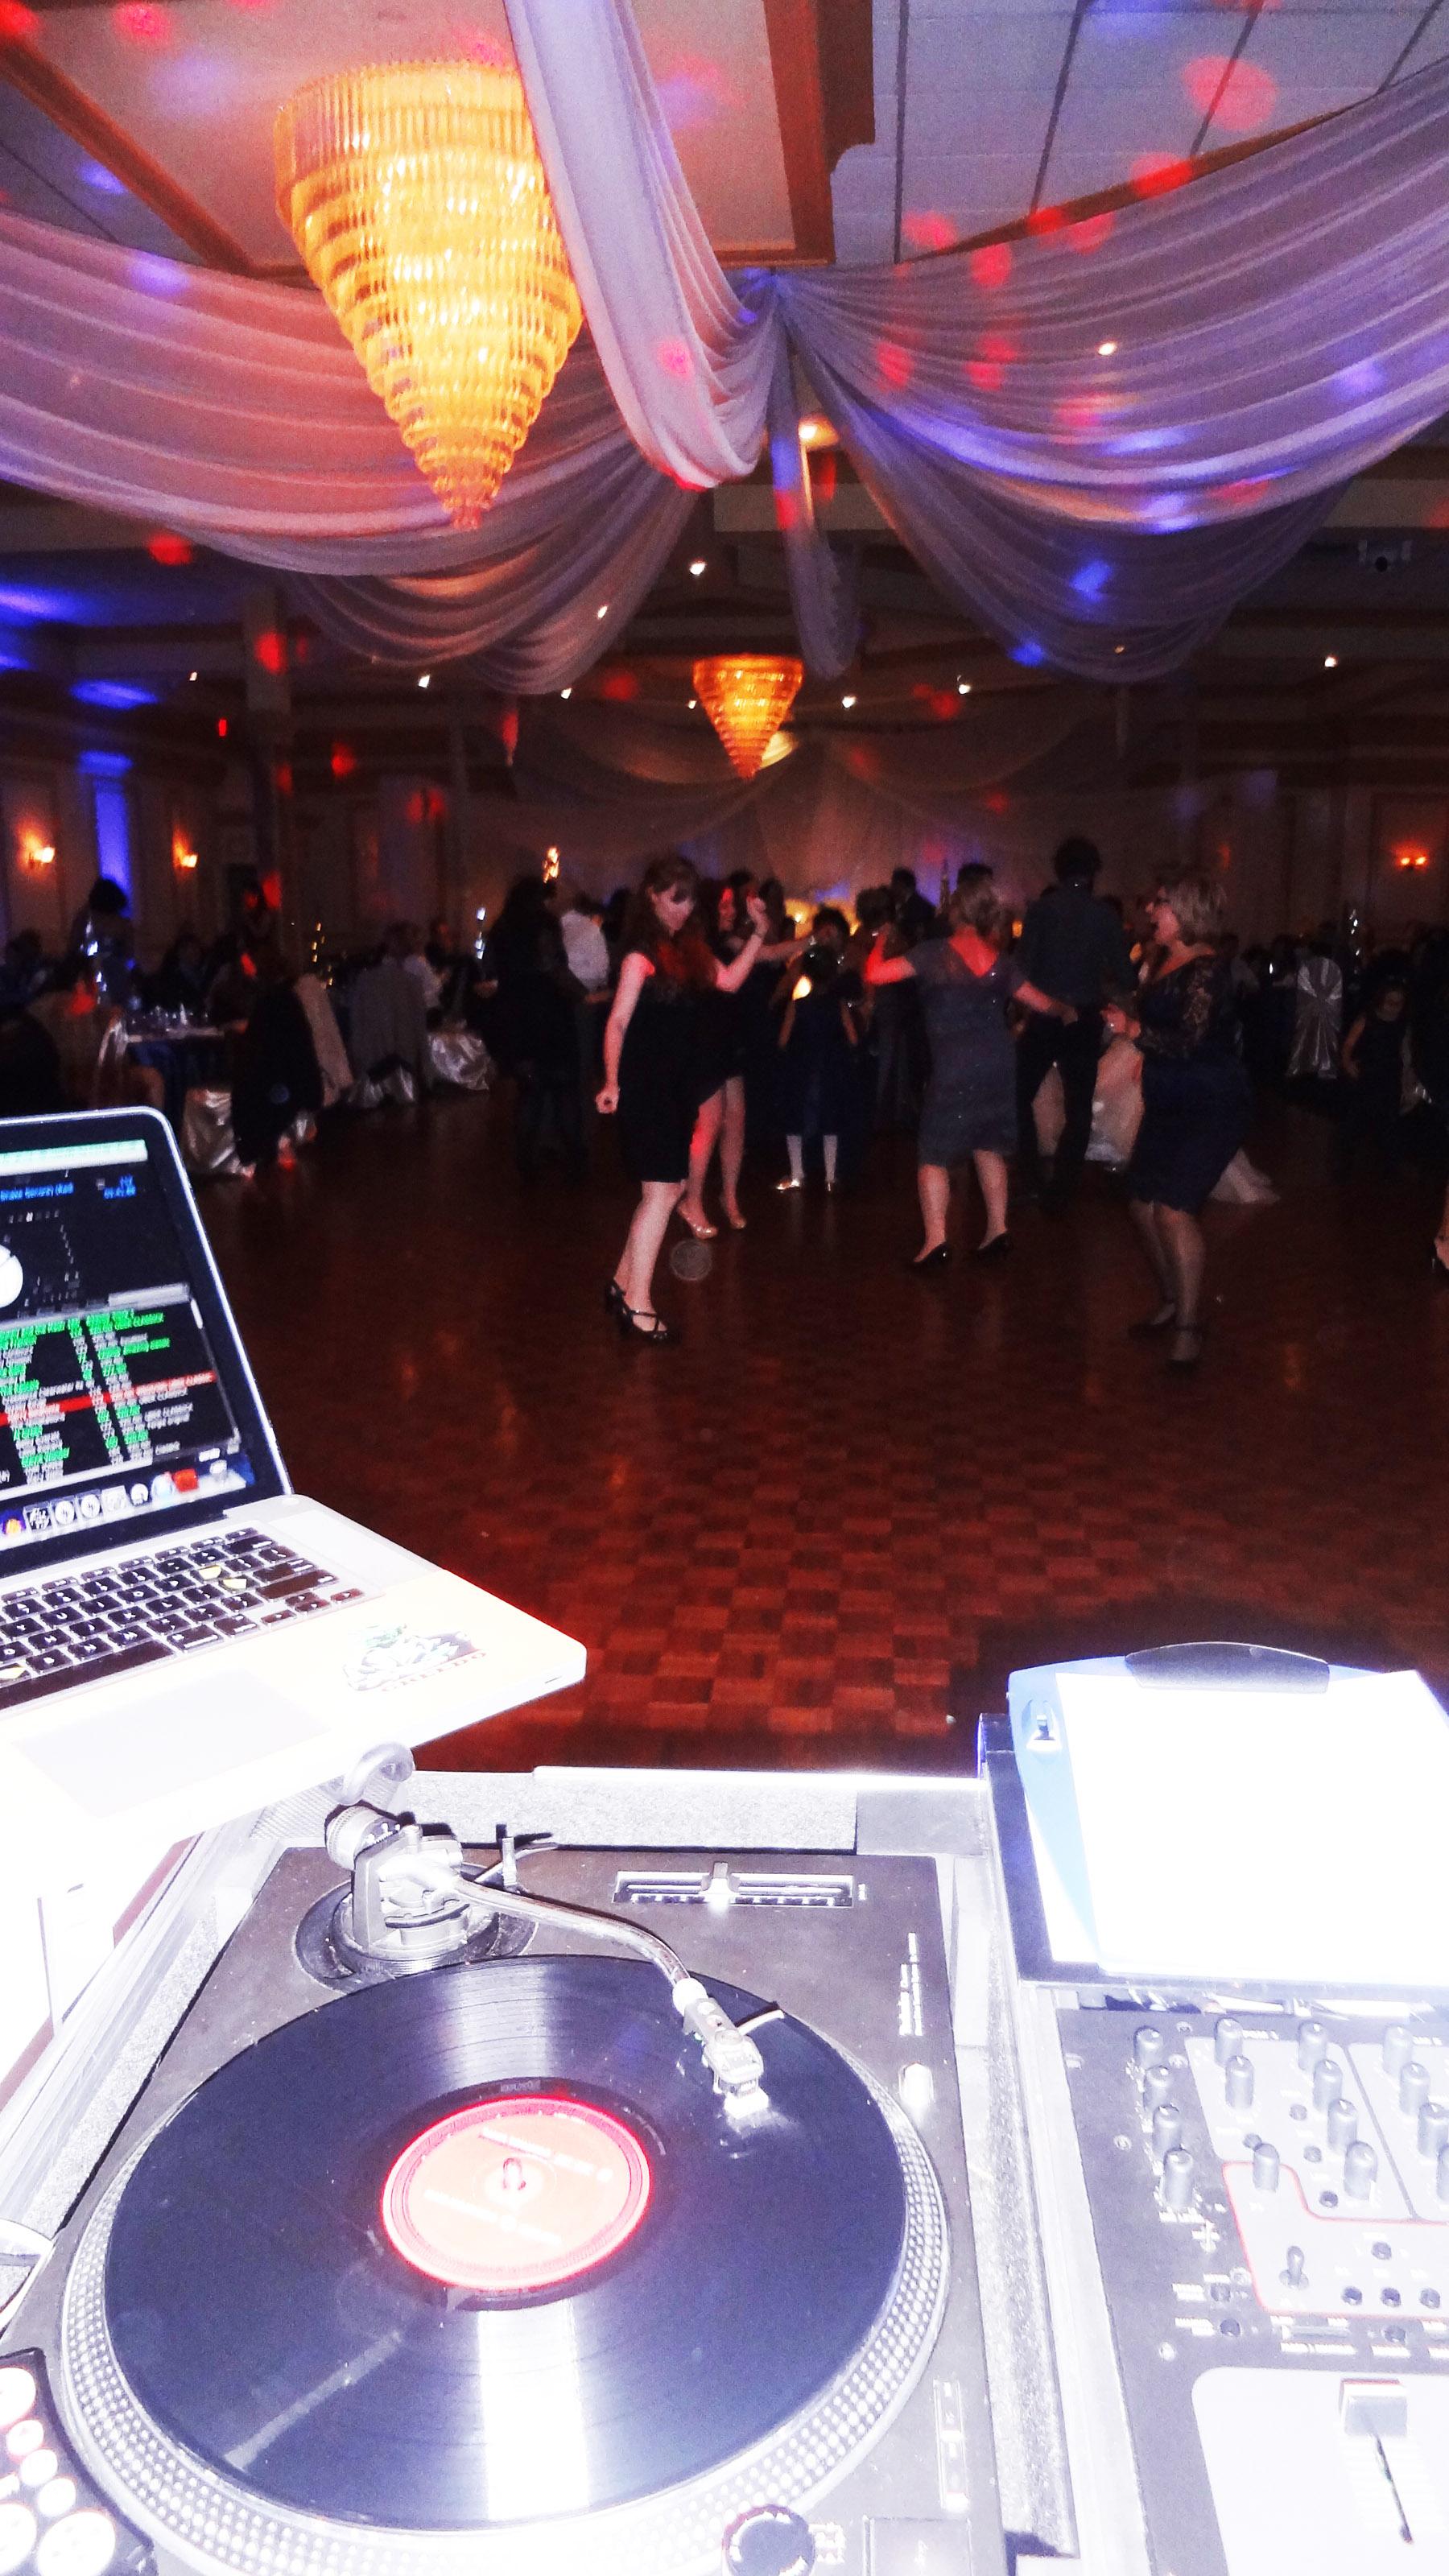 Turntables Dj Set Up Dance Floor Del Vinyl Premier Place.jpg